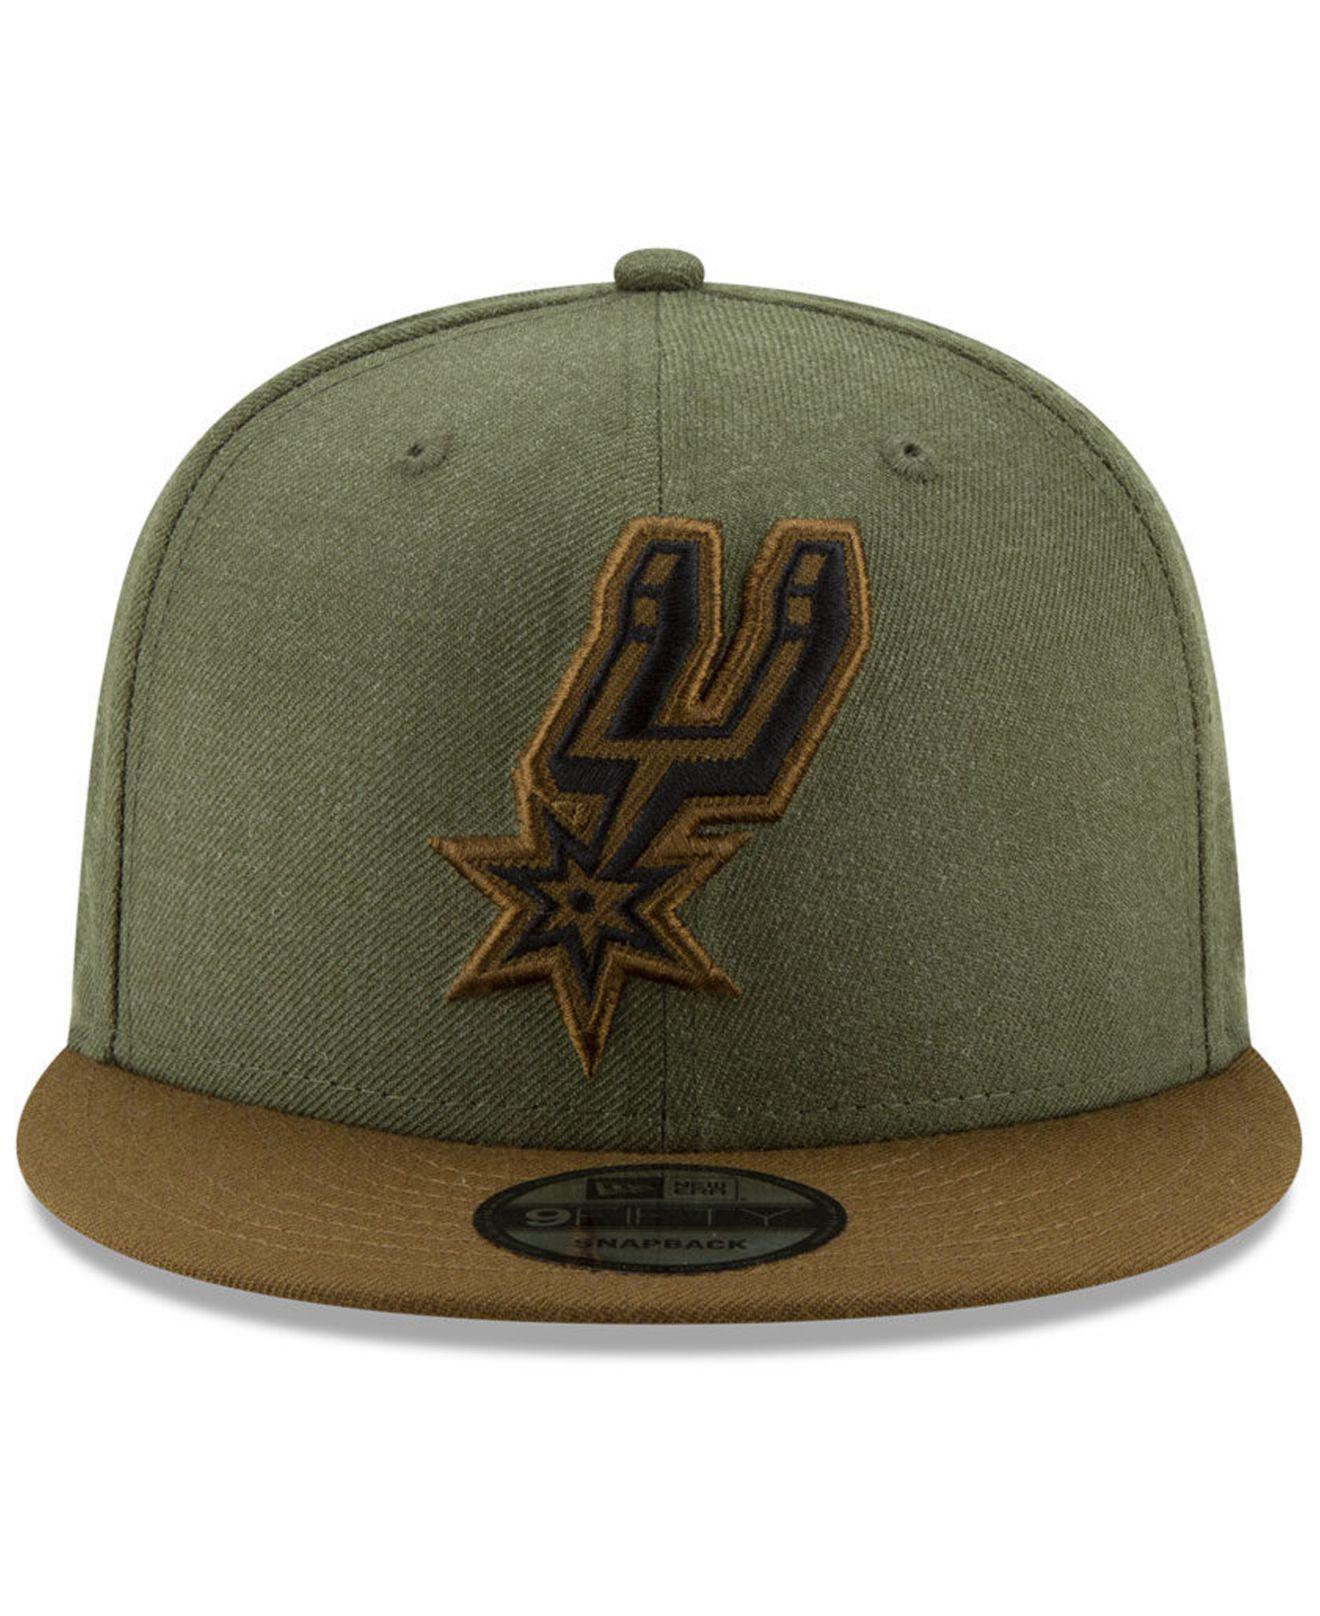 brand new 4343d bc7e0 ... czech lyst ktz san antonio spurs enlisted 9fifty snapback cap in green  for men 2b630 fbc1f